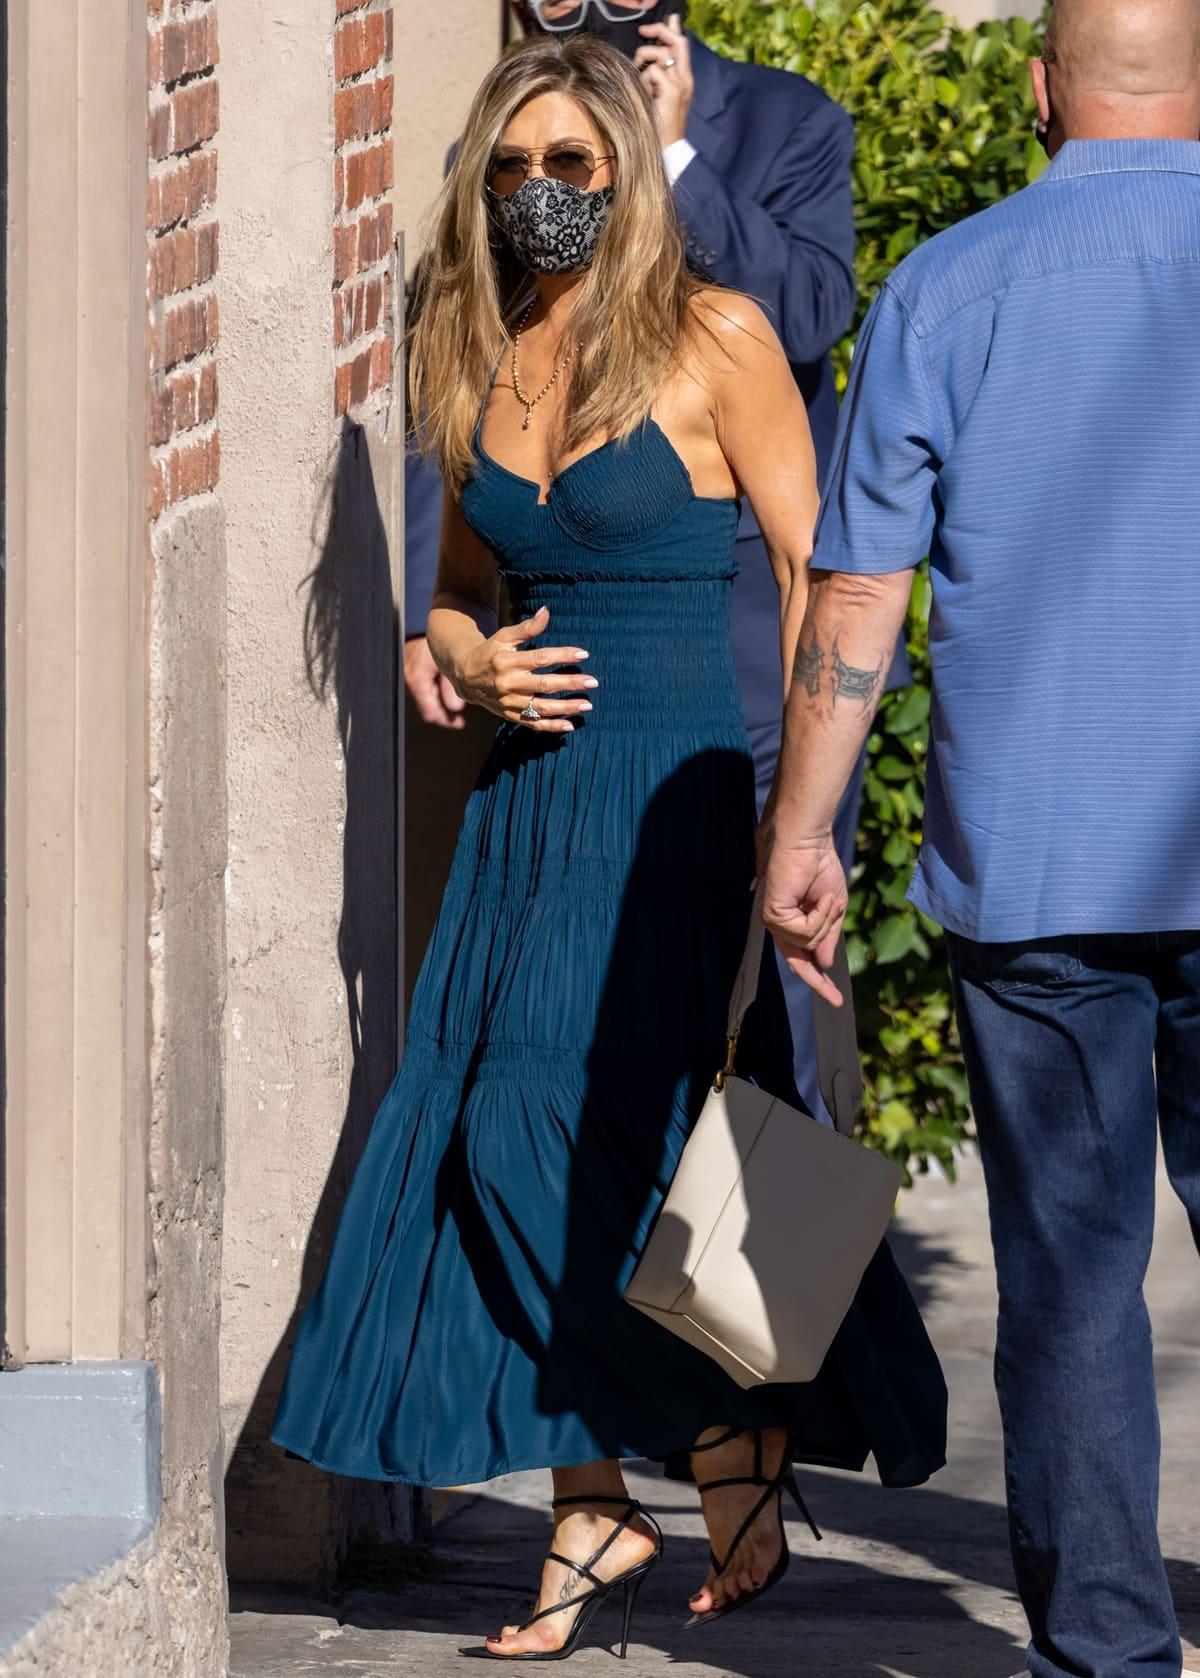 Jennifer Aniston in a Proenza Schouler smocked bustier dress and Saint Laurent Instinct sandals